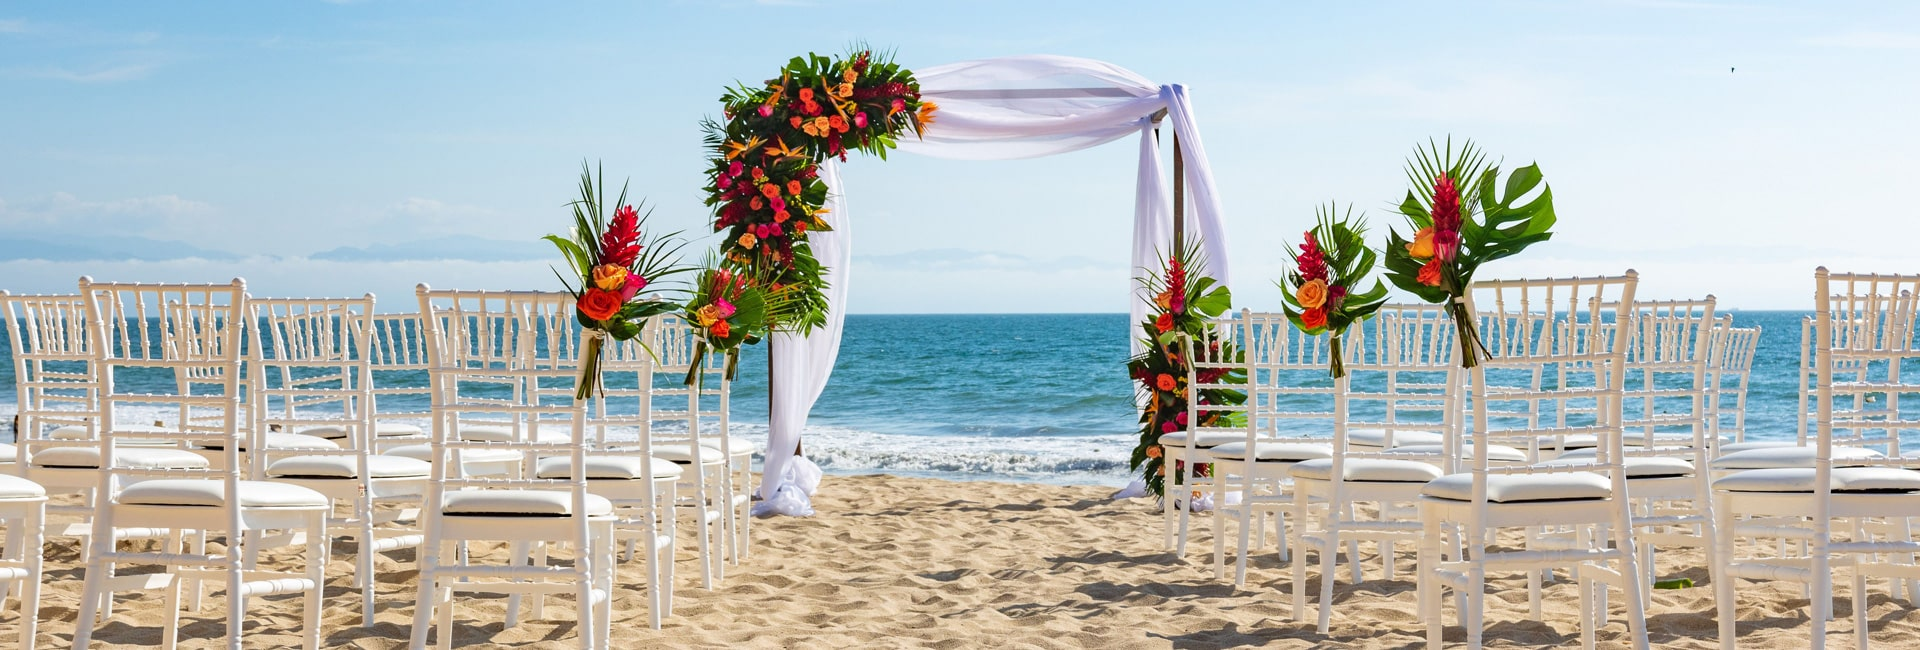 The best puerto vallarta wedding venues